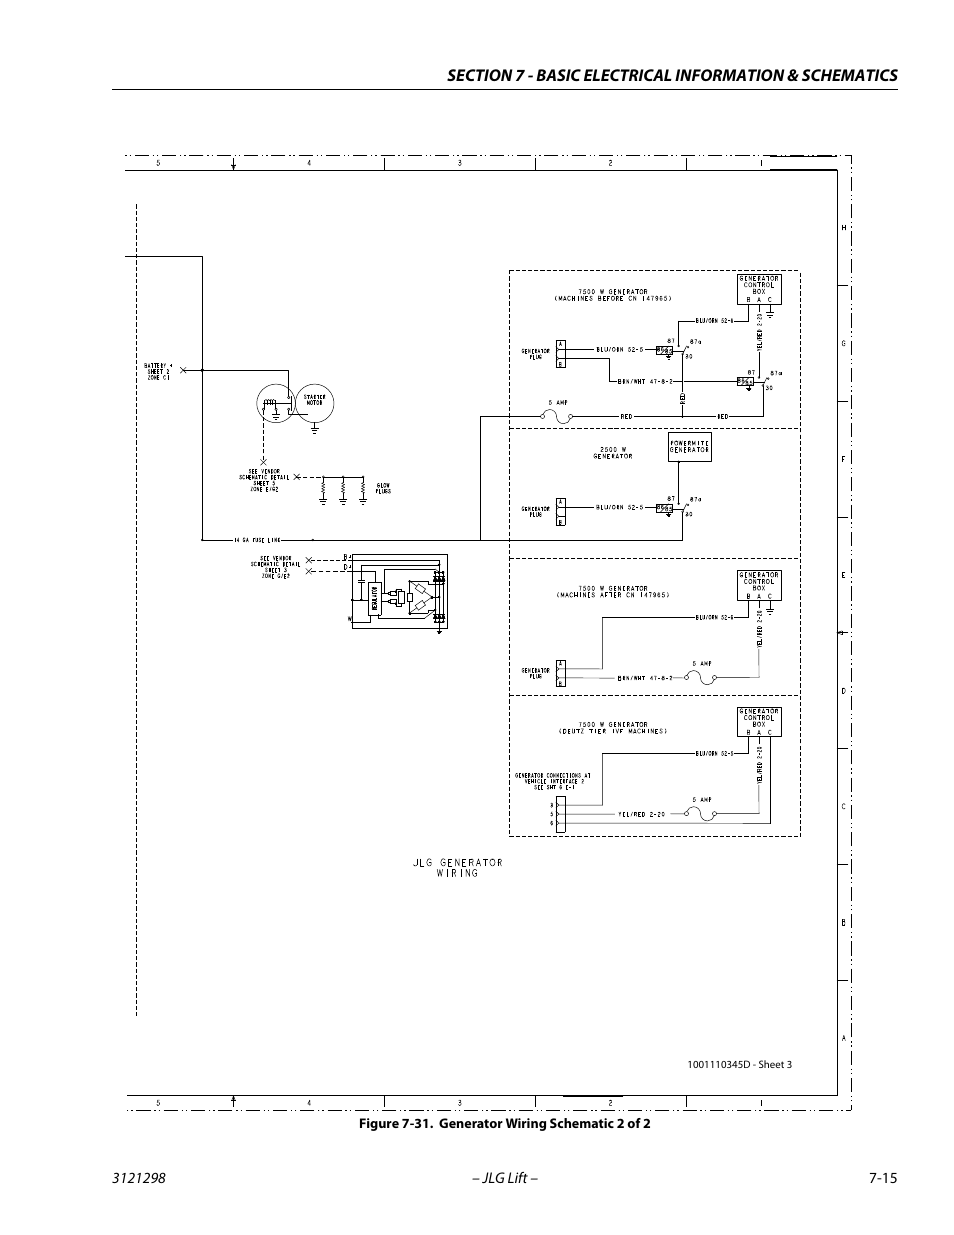 generator wiring schematic 2 of 2 15 jlg 660sj service. Black Bedroom Furniture Sets. Home Design Ideas